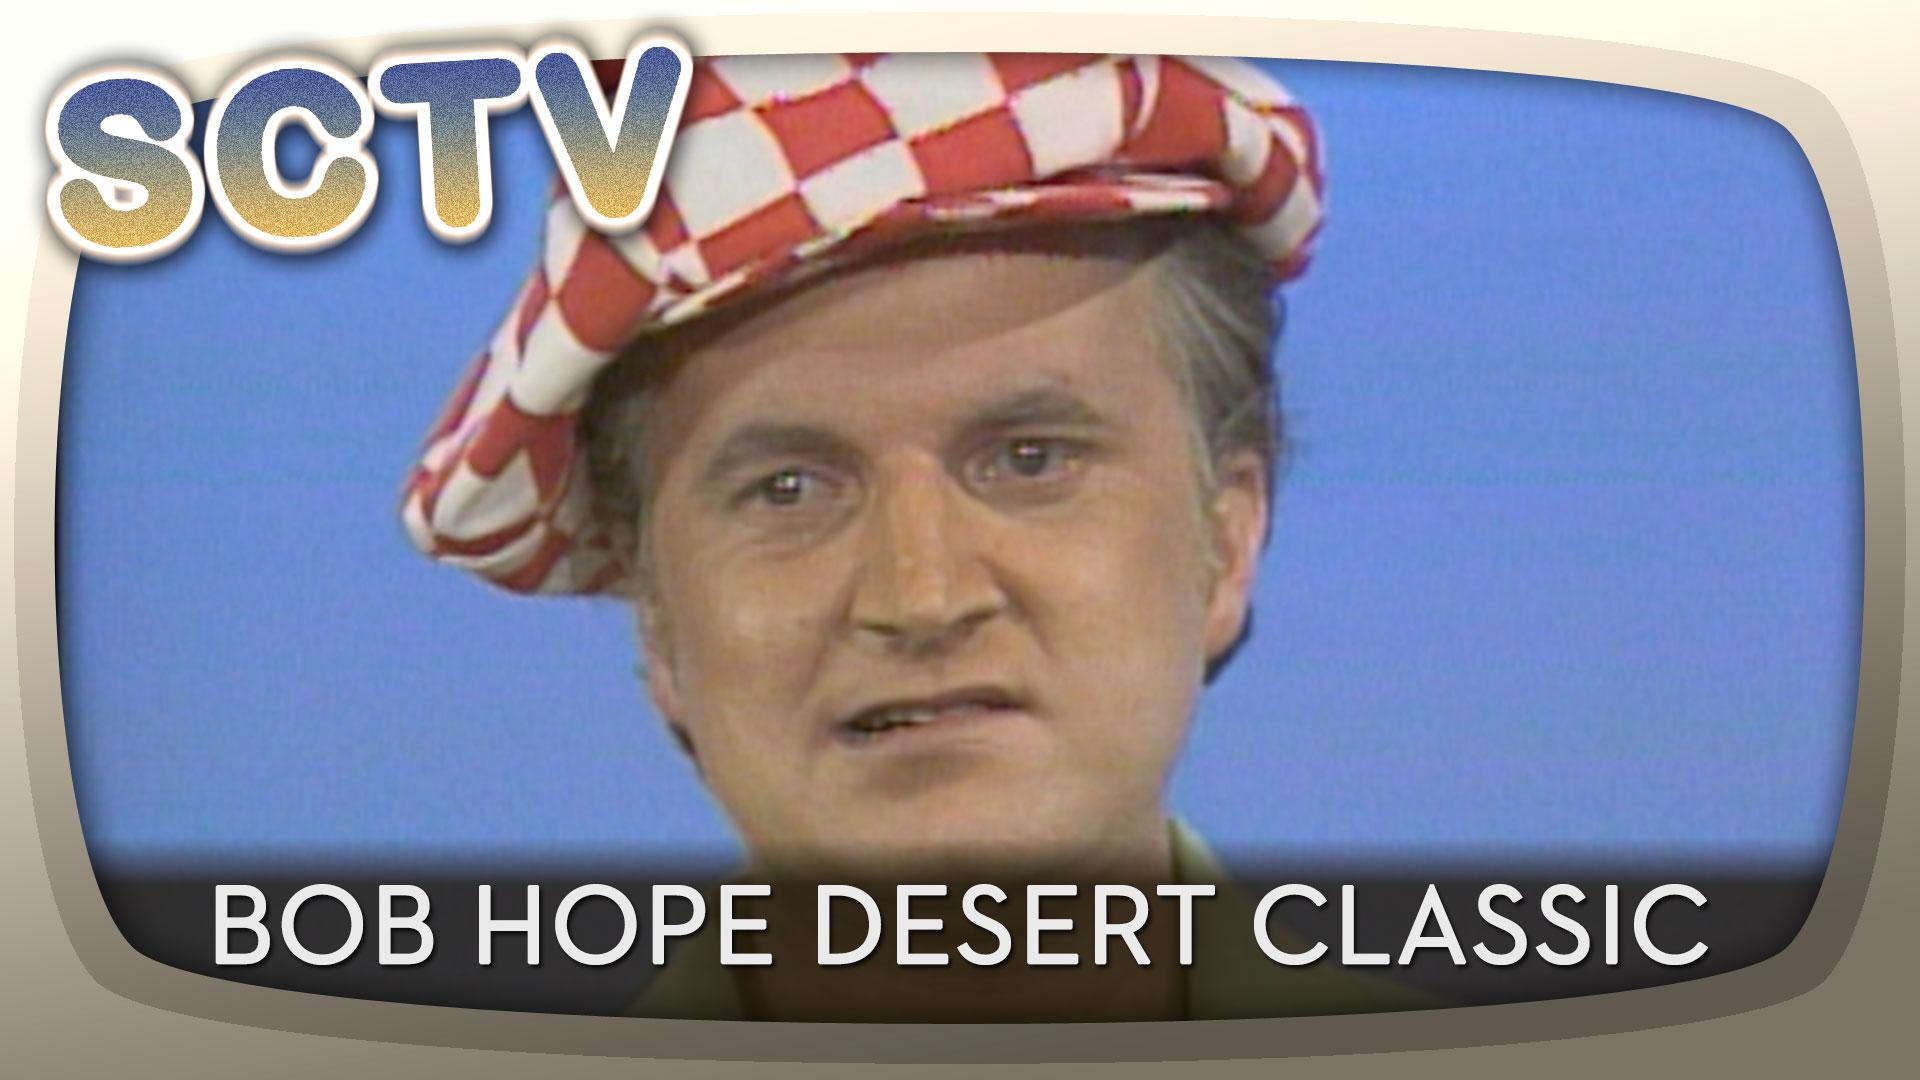 SCTV - Bob Hope Desert Classic